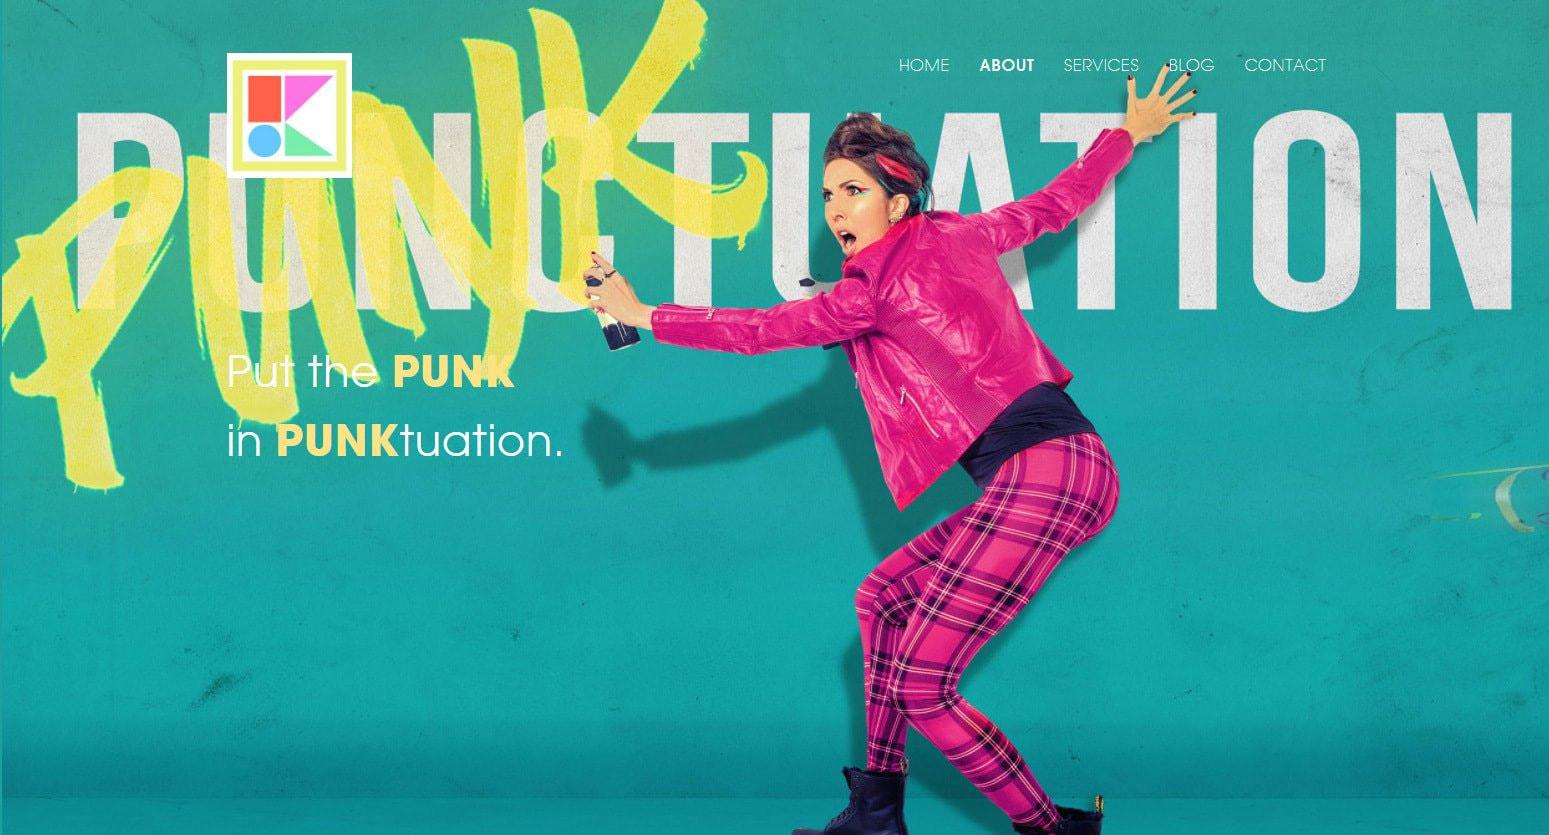 Punknation